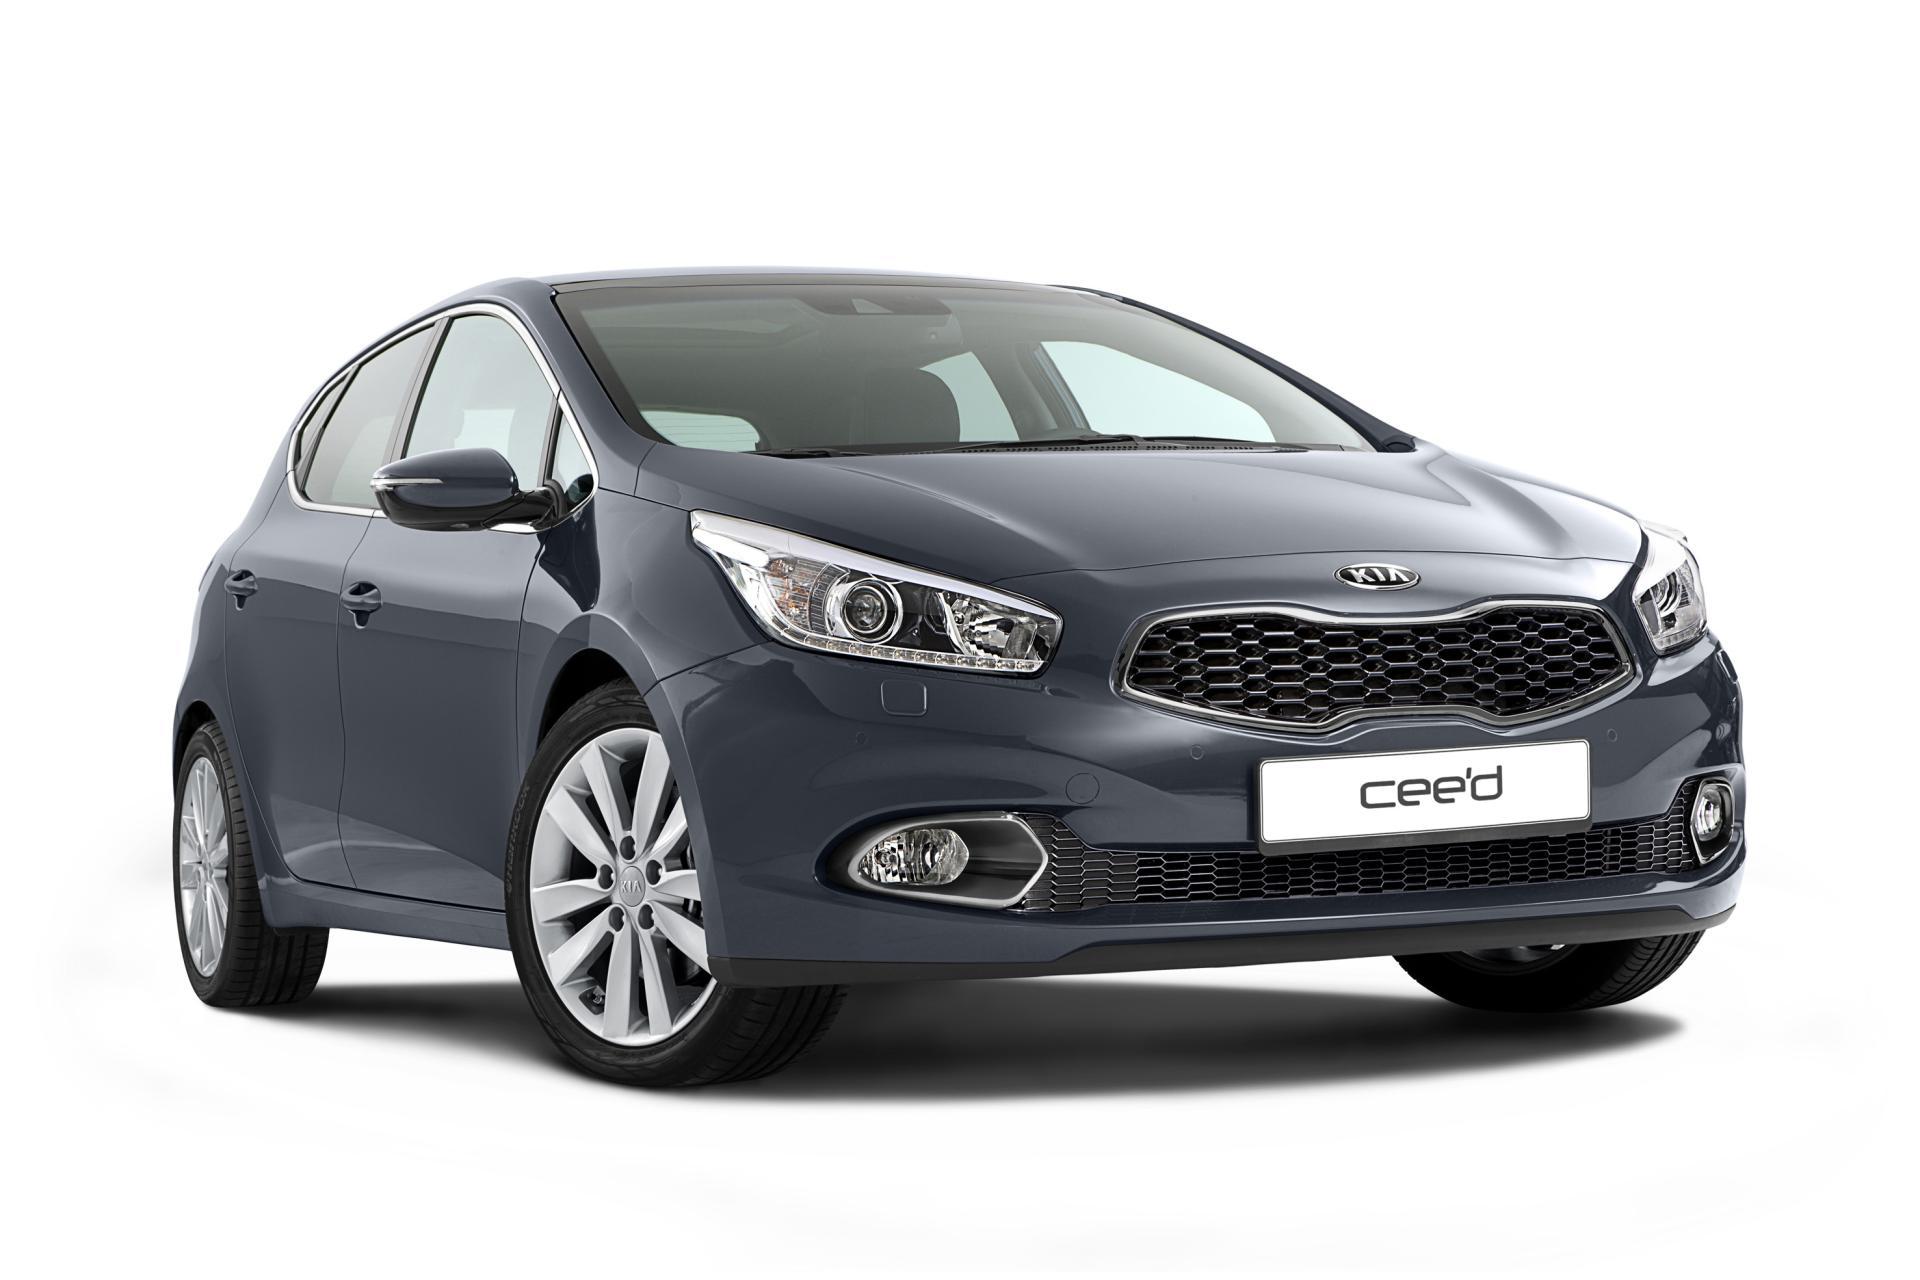 2013 Kia Ceed News And Information Optima Balance Shaft